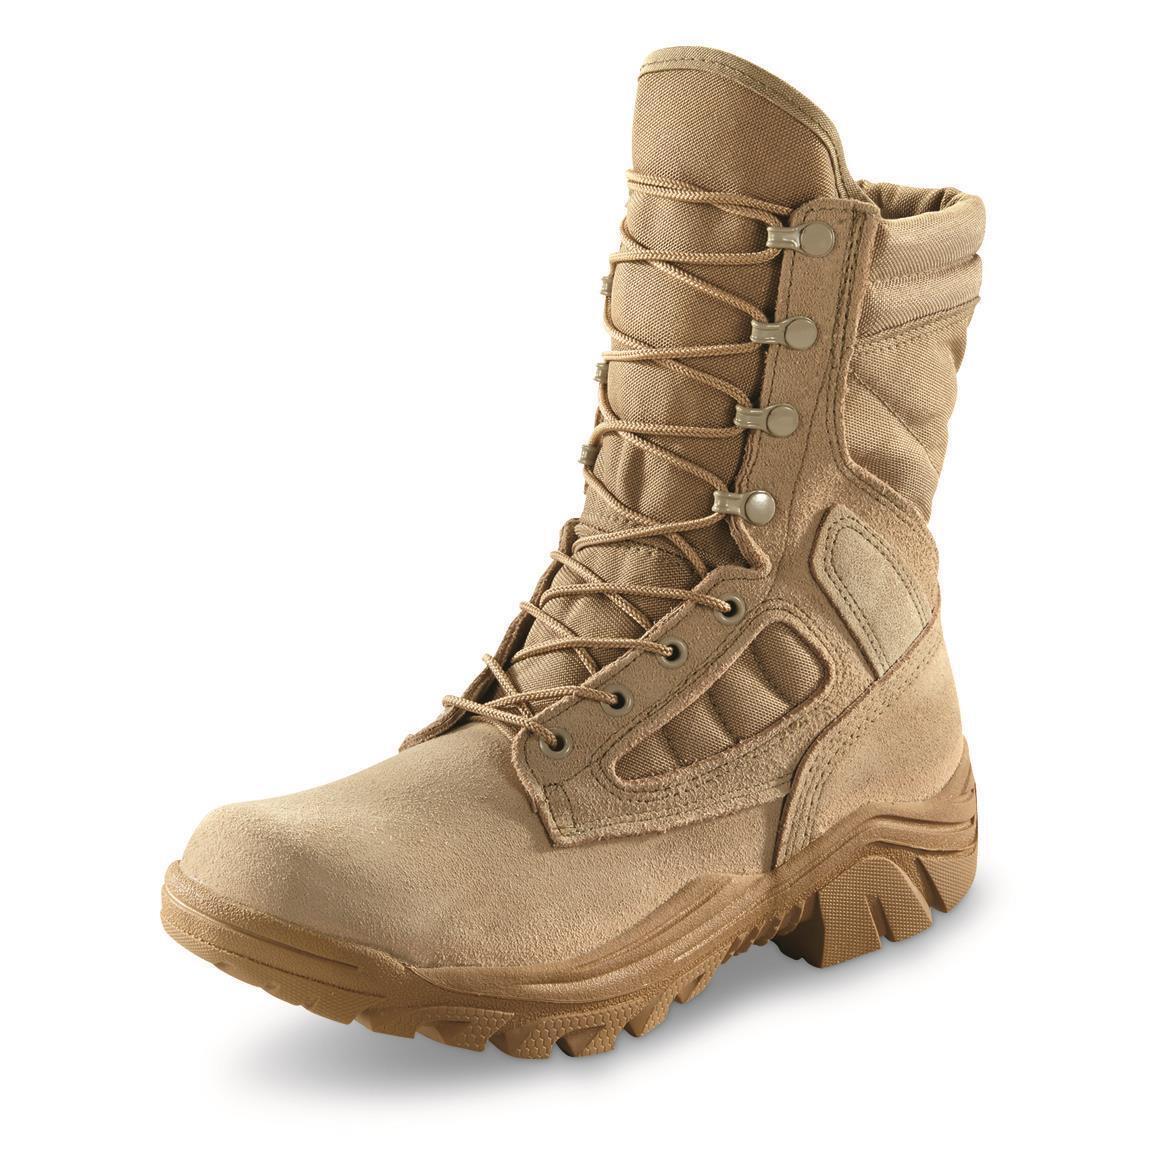 NEW CORCORAN Men's 8  Hot Weather Broad Toe Combat Boots Tan